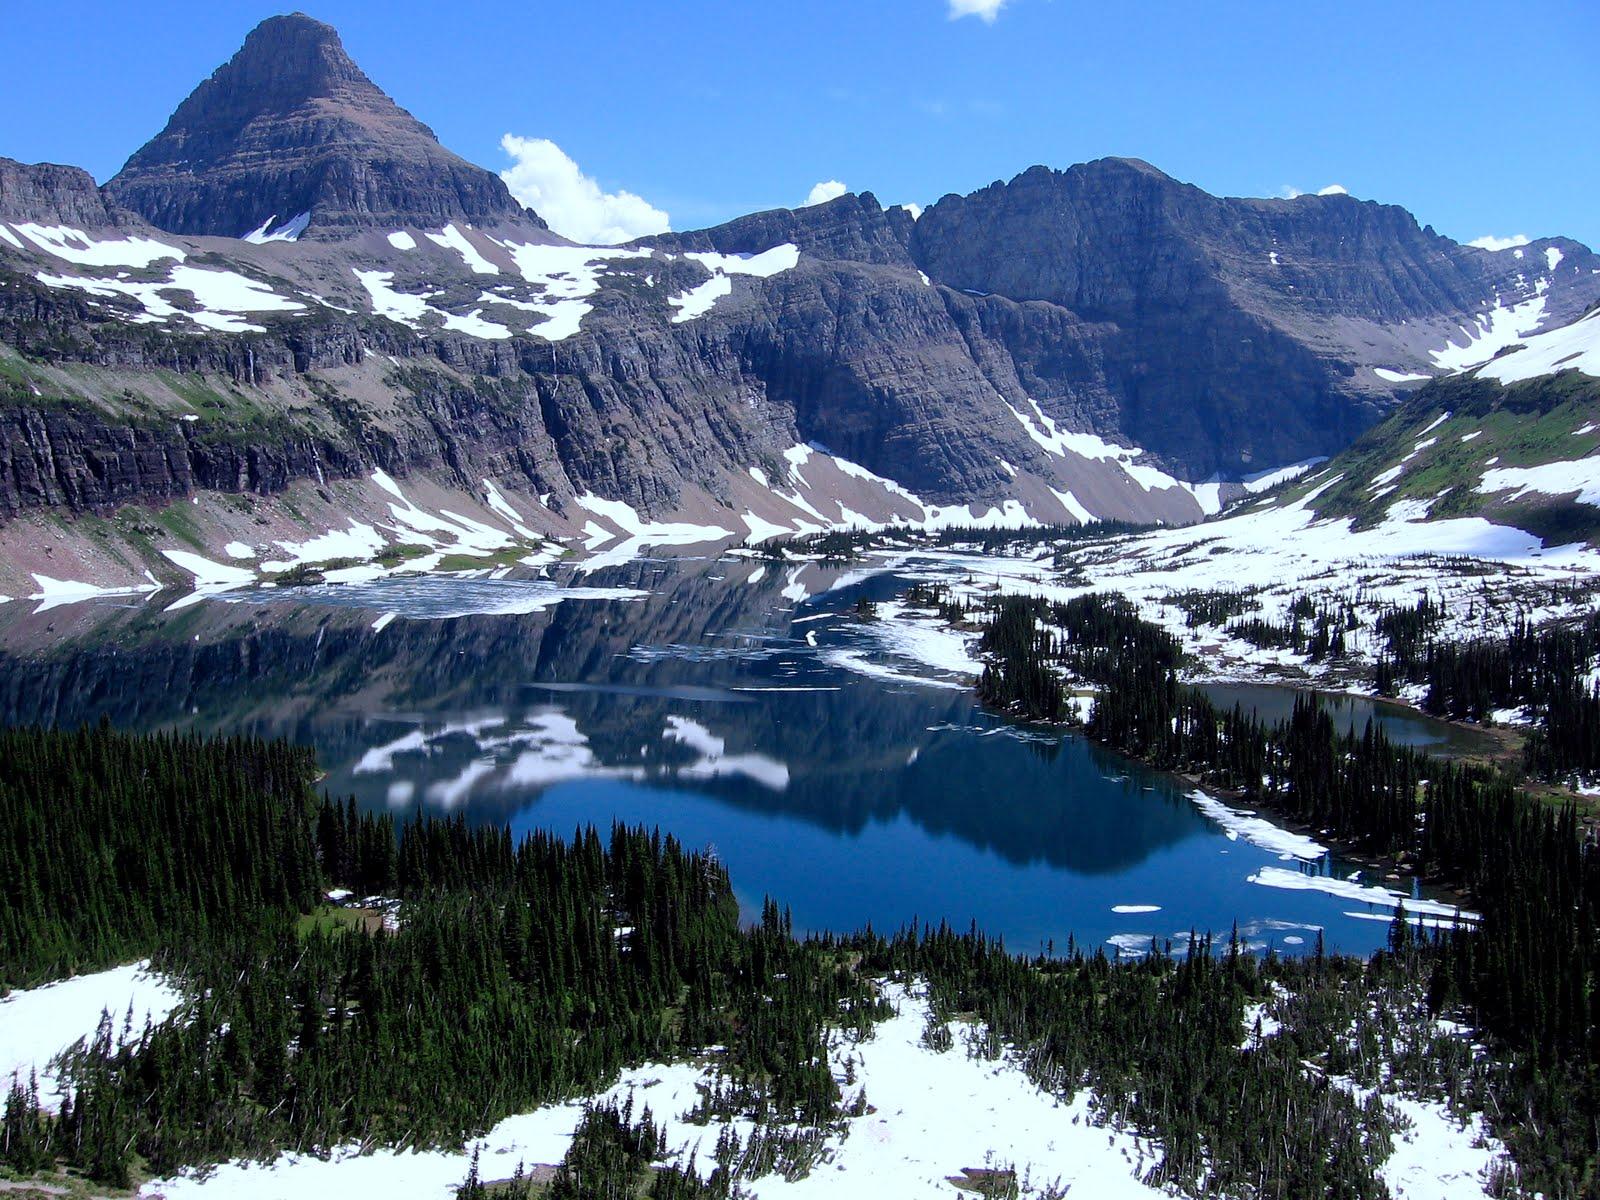 glacier national park photo - photo #2